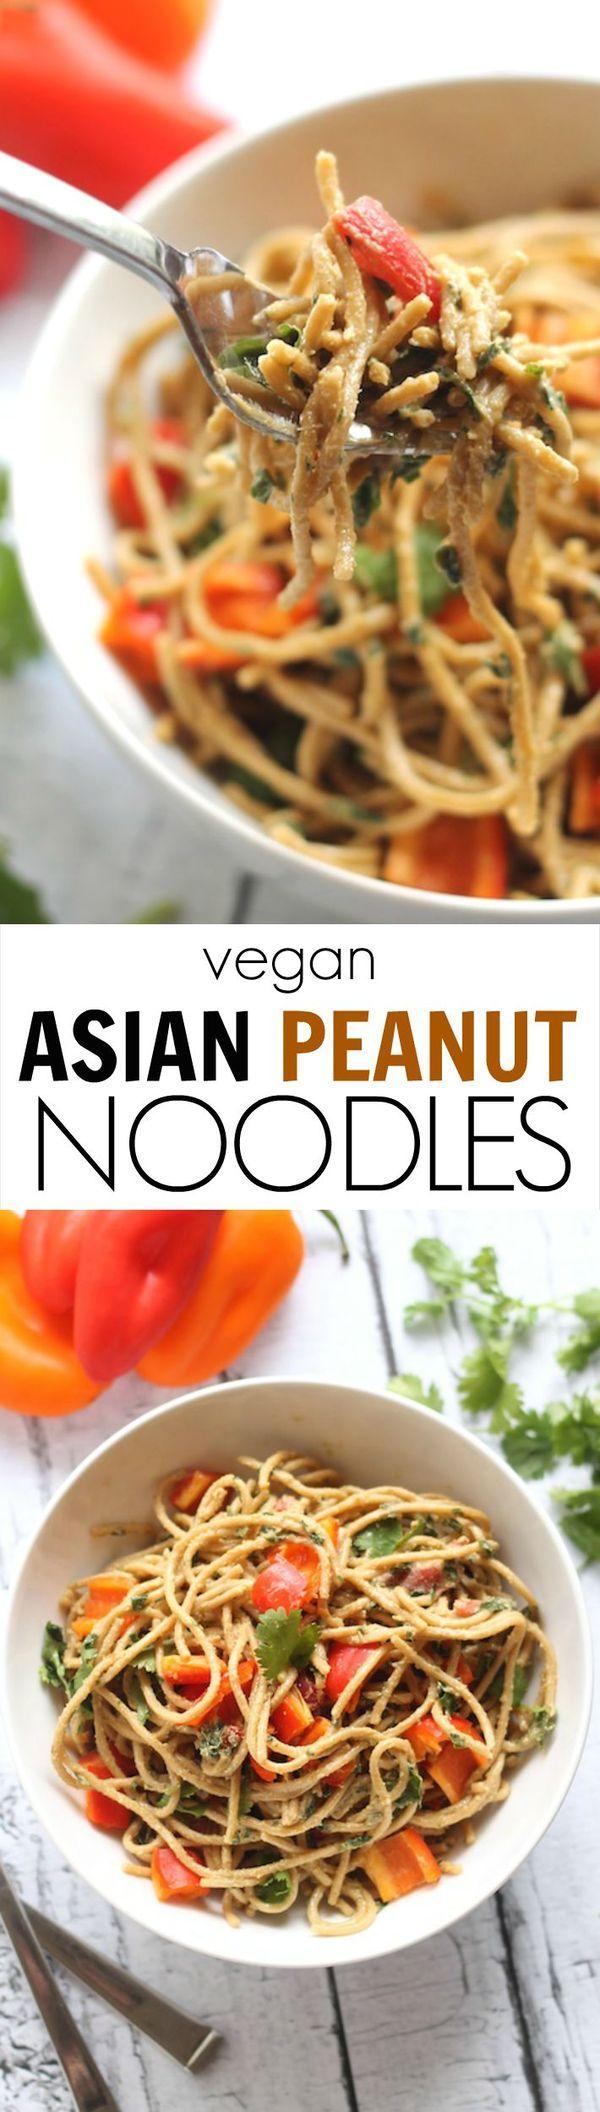 Asian Peanut Noodles   Recipe   Peanut Noodles, Noodles and Peanuts